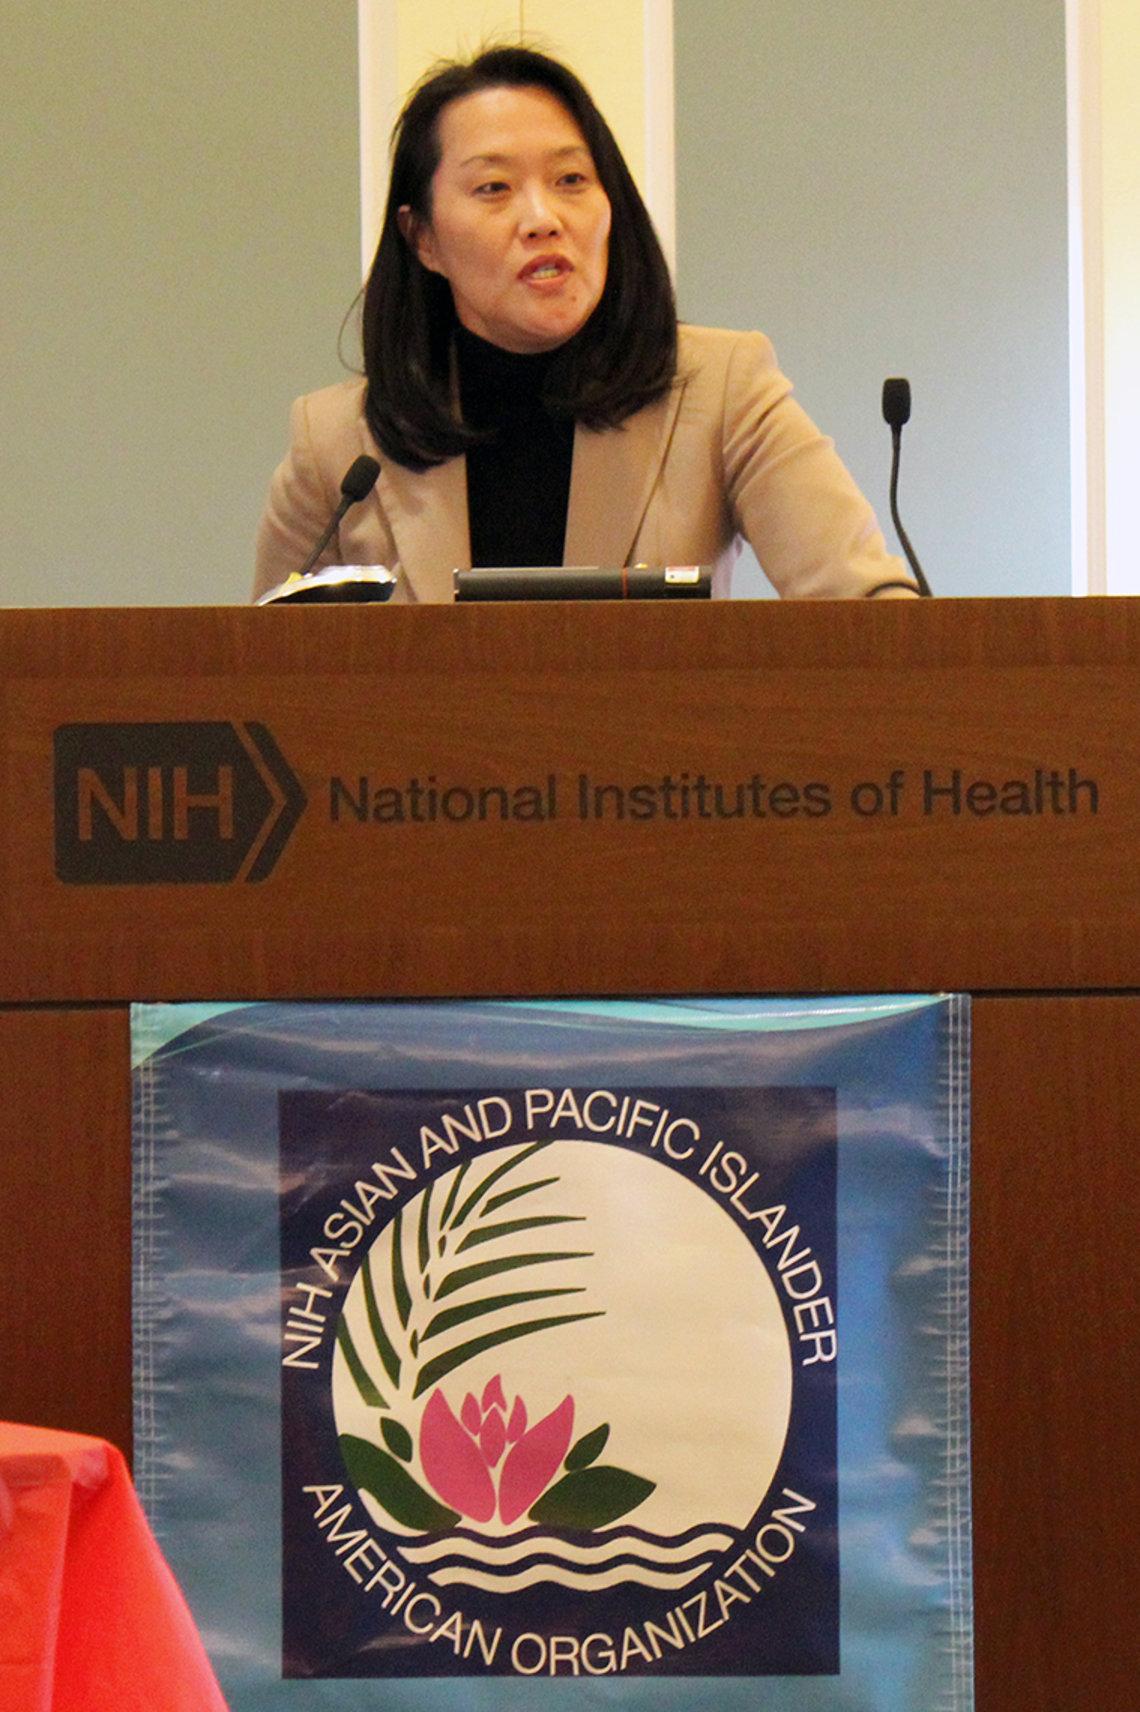 Keynote speaker Dr. Janice Lee at podium